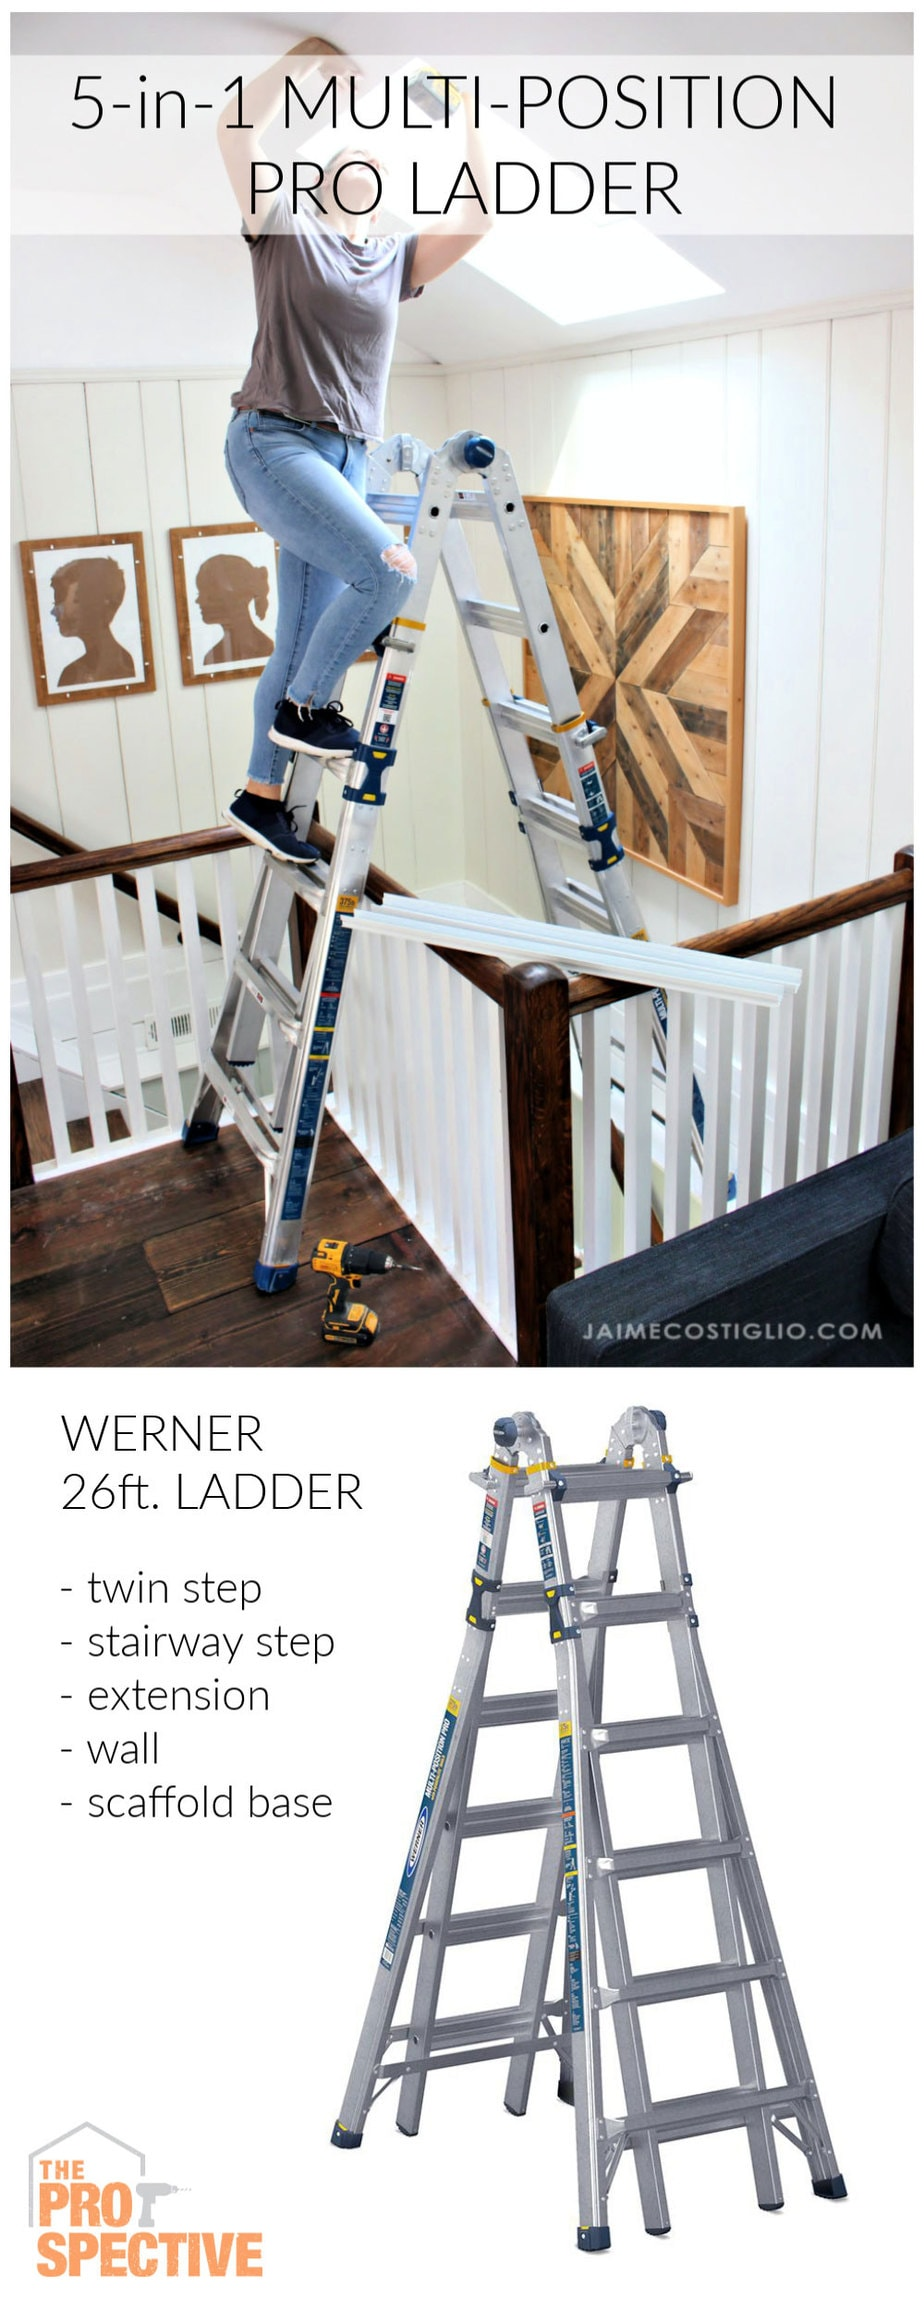 26 ft. multi-position pro ladder